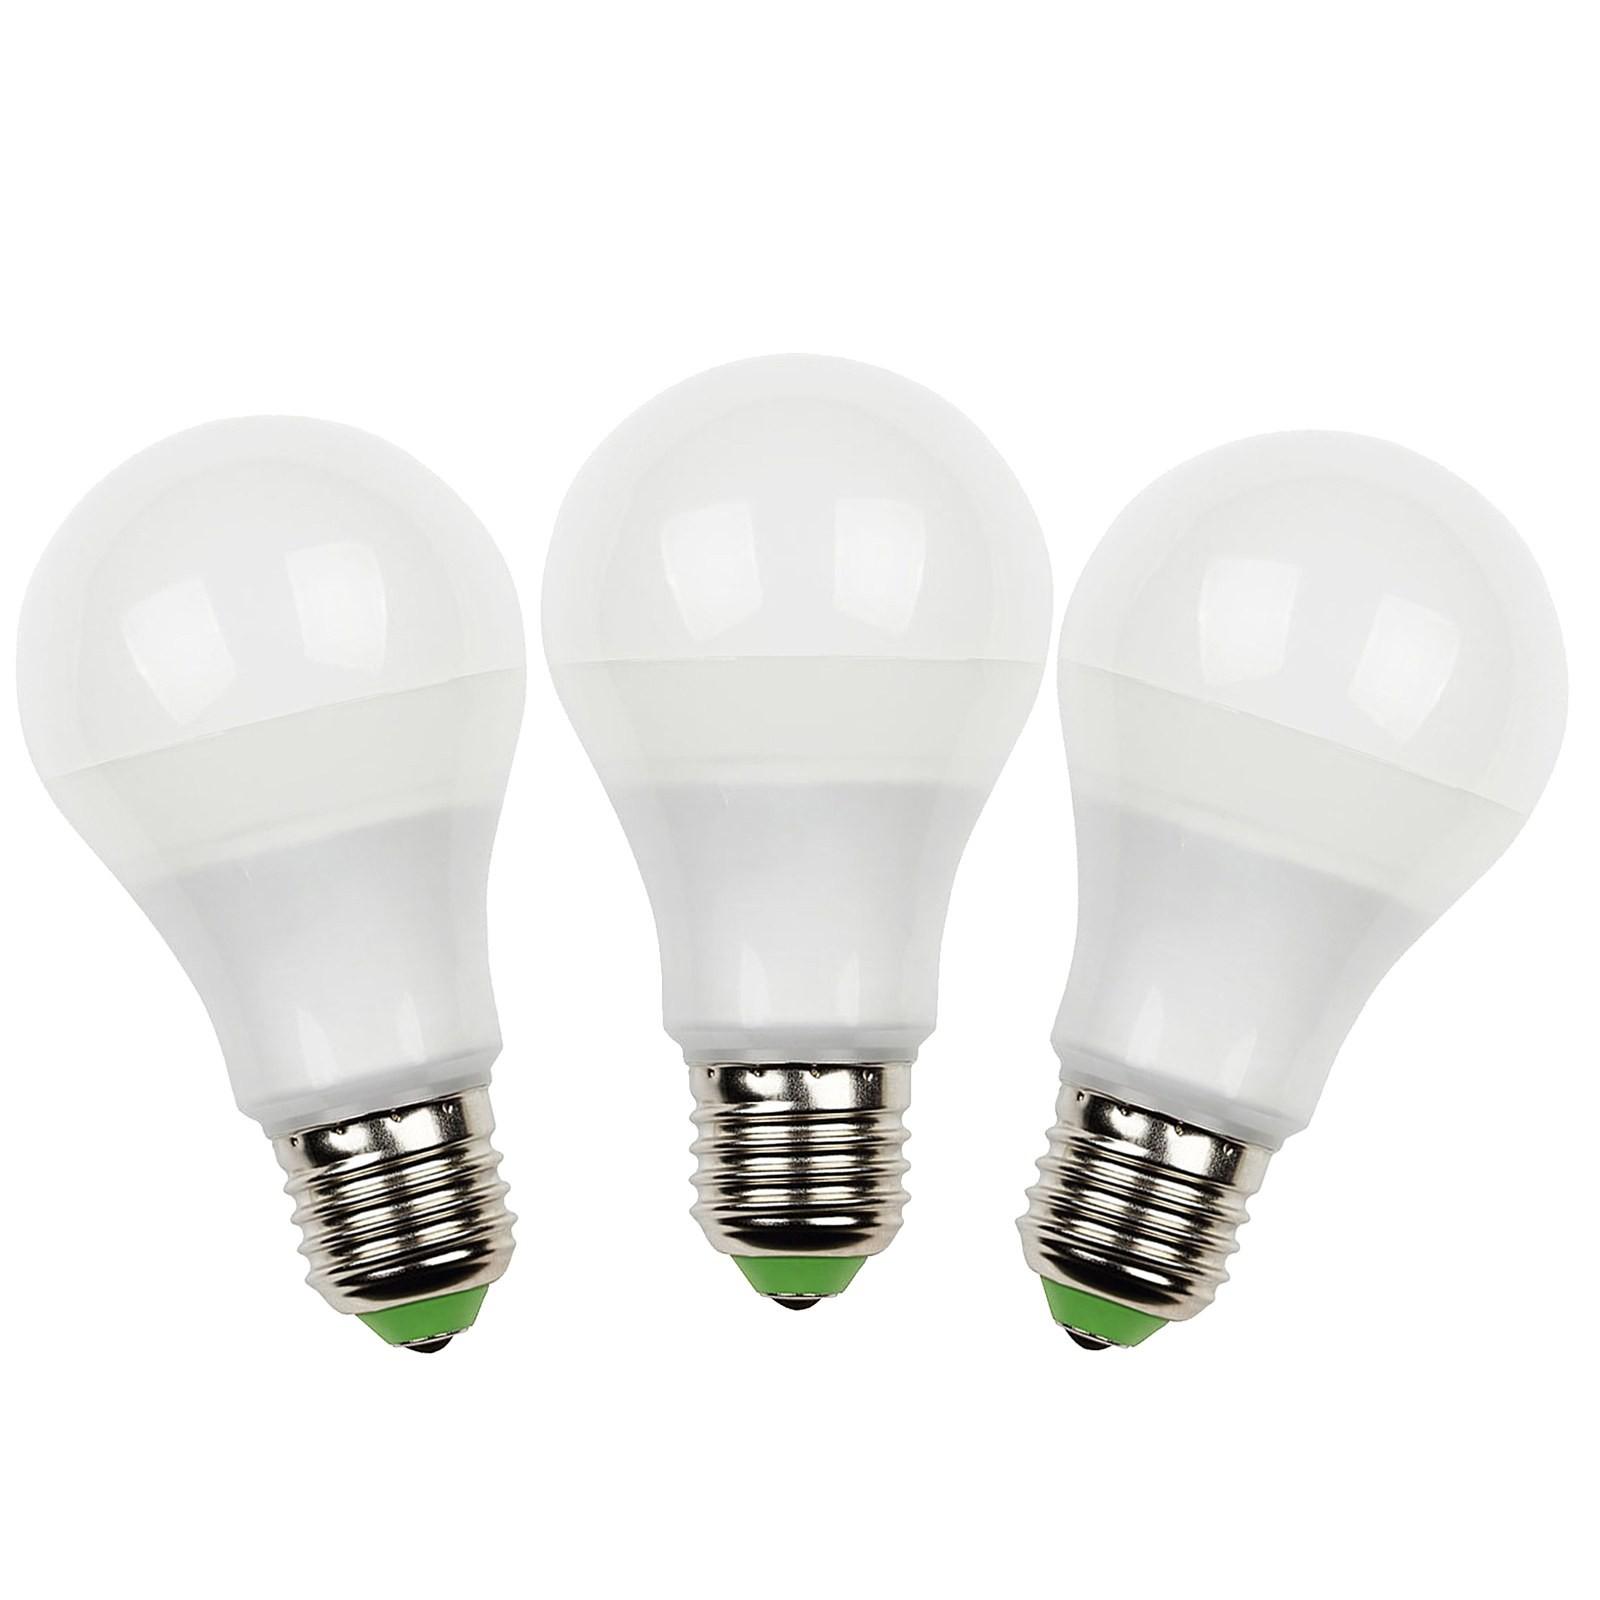 3 pz lampade lampada lampadine a led luce calda attacco